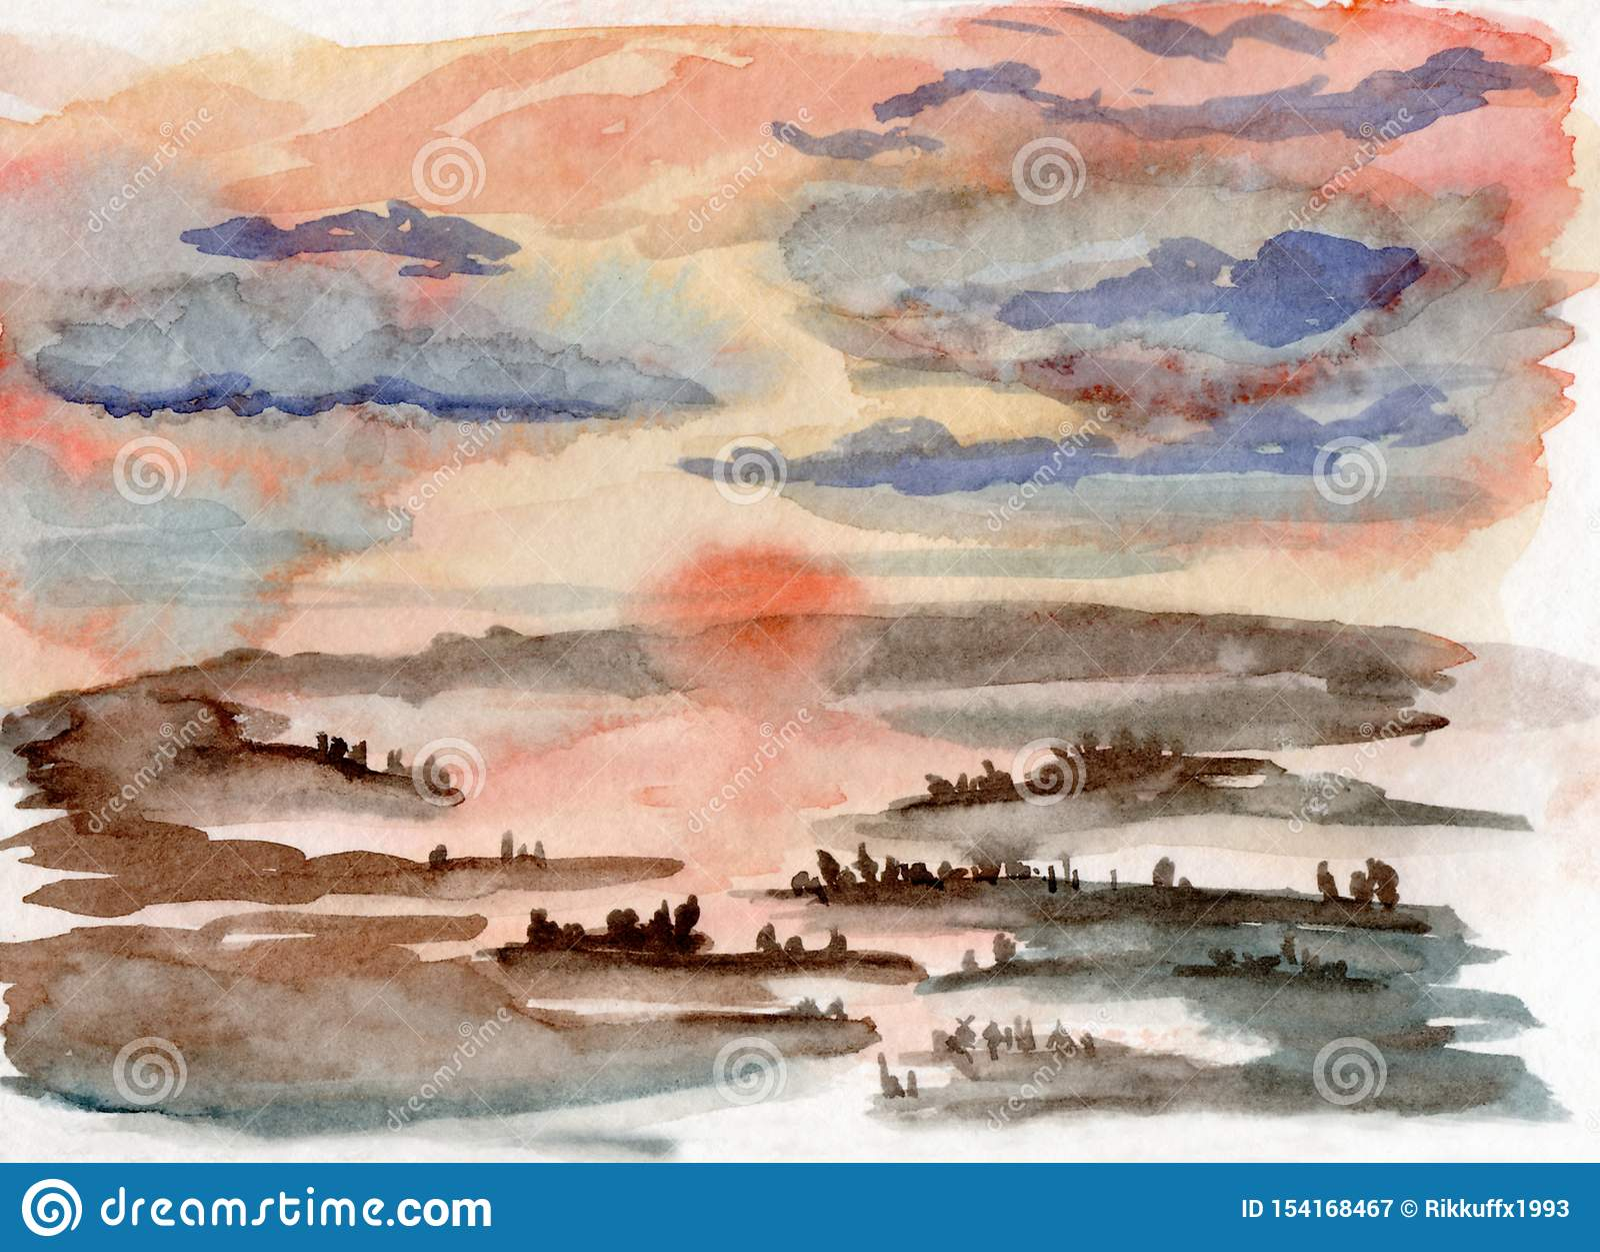 Иллюстрация акварели туманного захода солнца в лесе с отражением реки